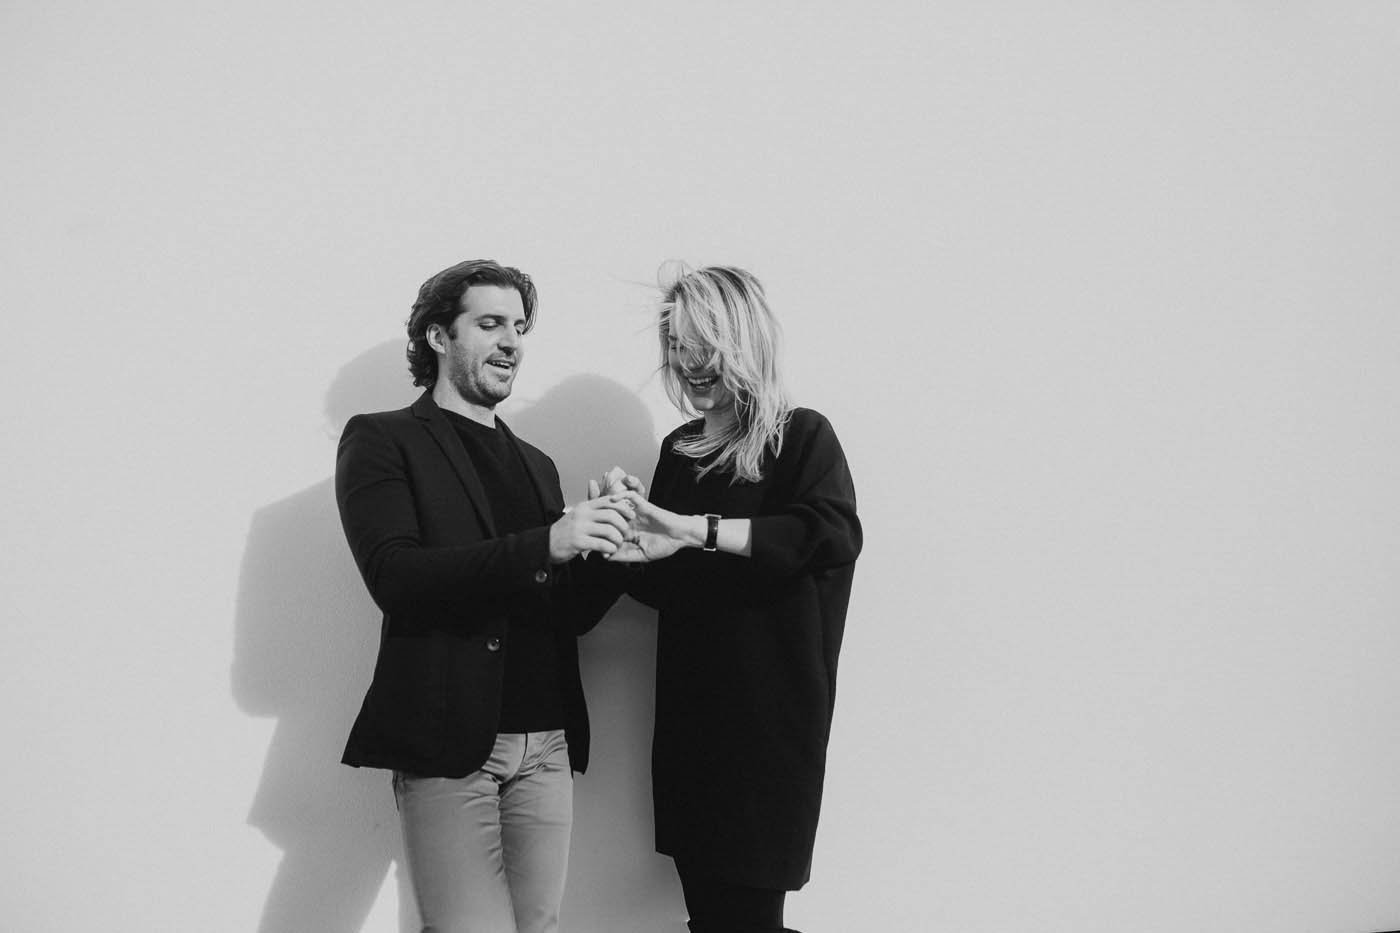 vienna-engagement-photographer-12